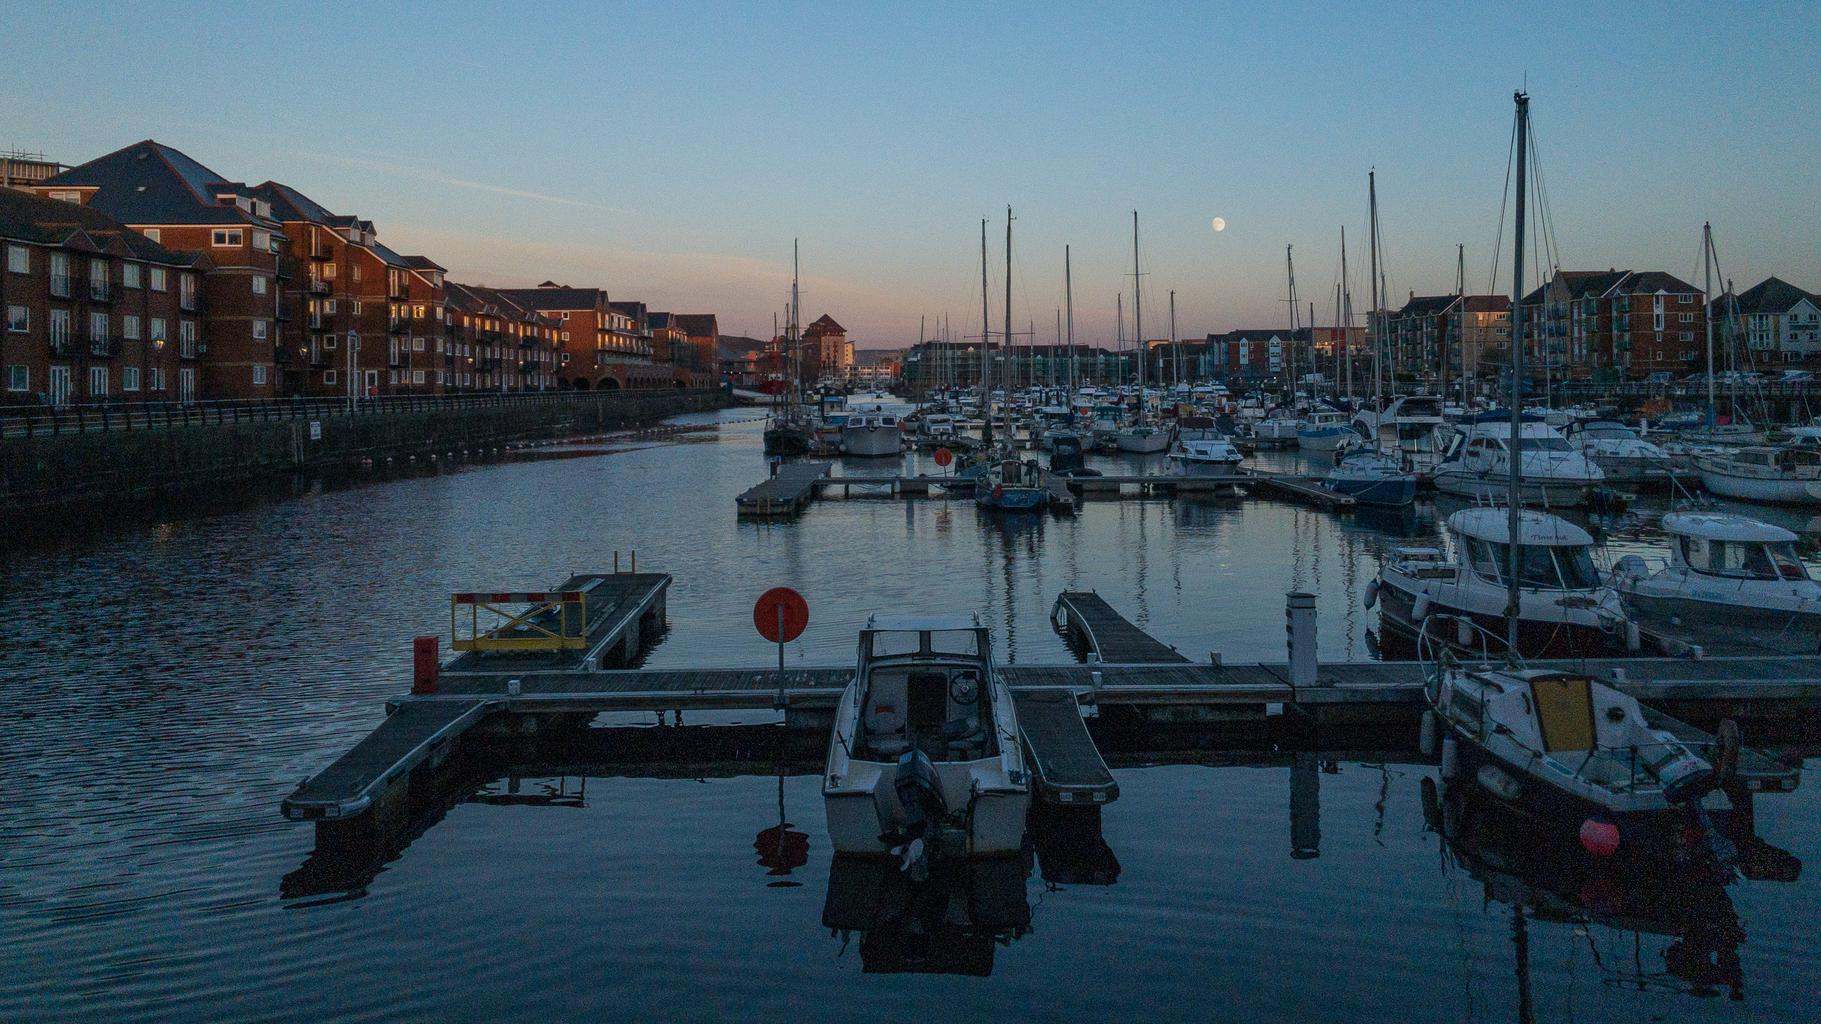 Moonrise over Swansea marina